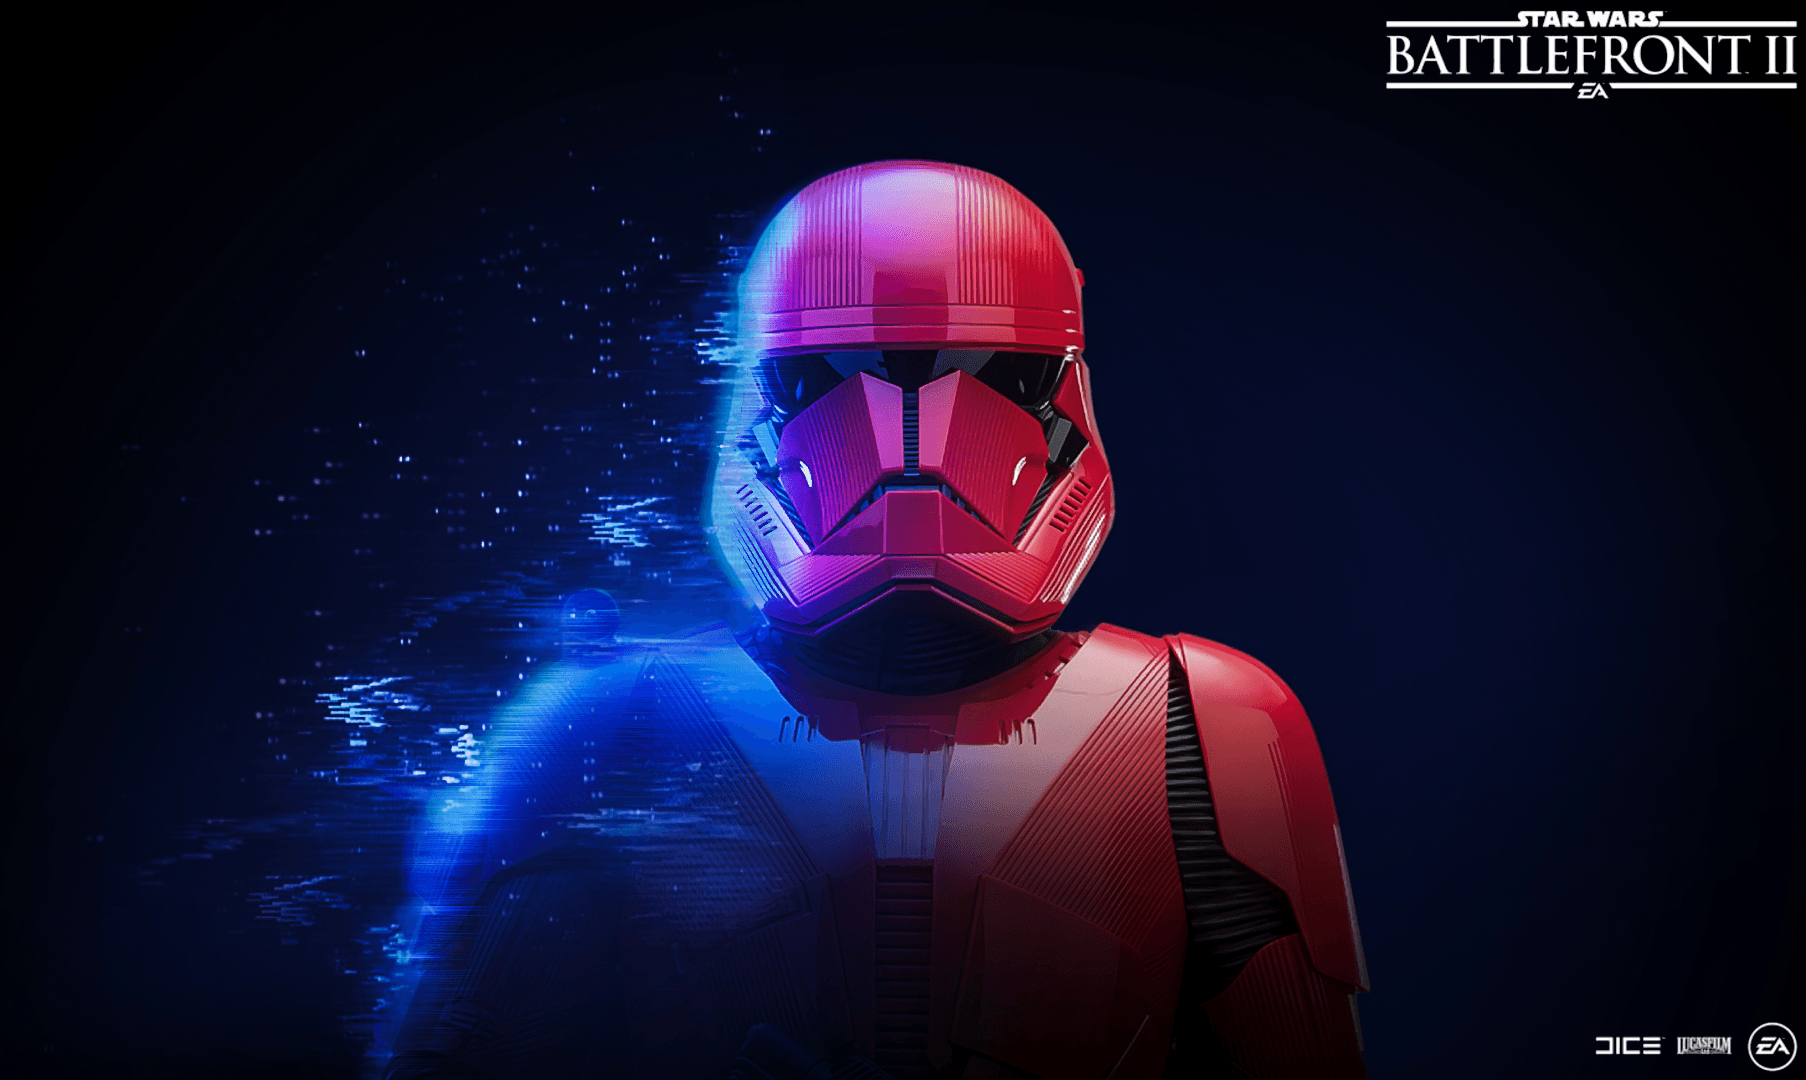 Star Wars Sith Trooper Wallpapers Top Free Star Wars Sith Trooper Backgrounds Wallpaperaccess